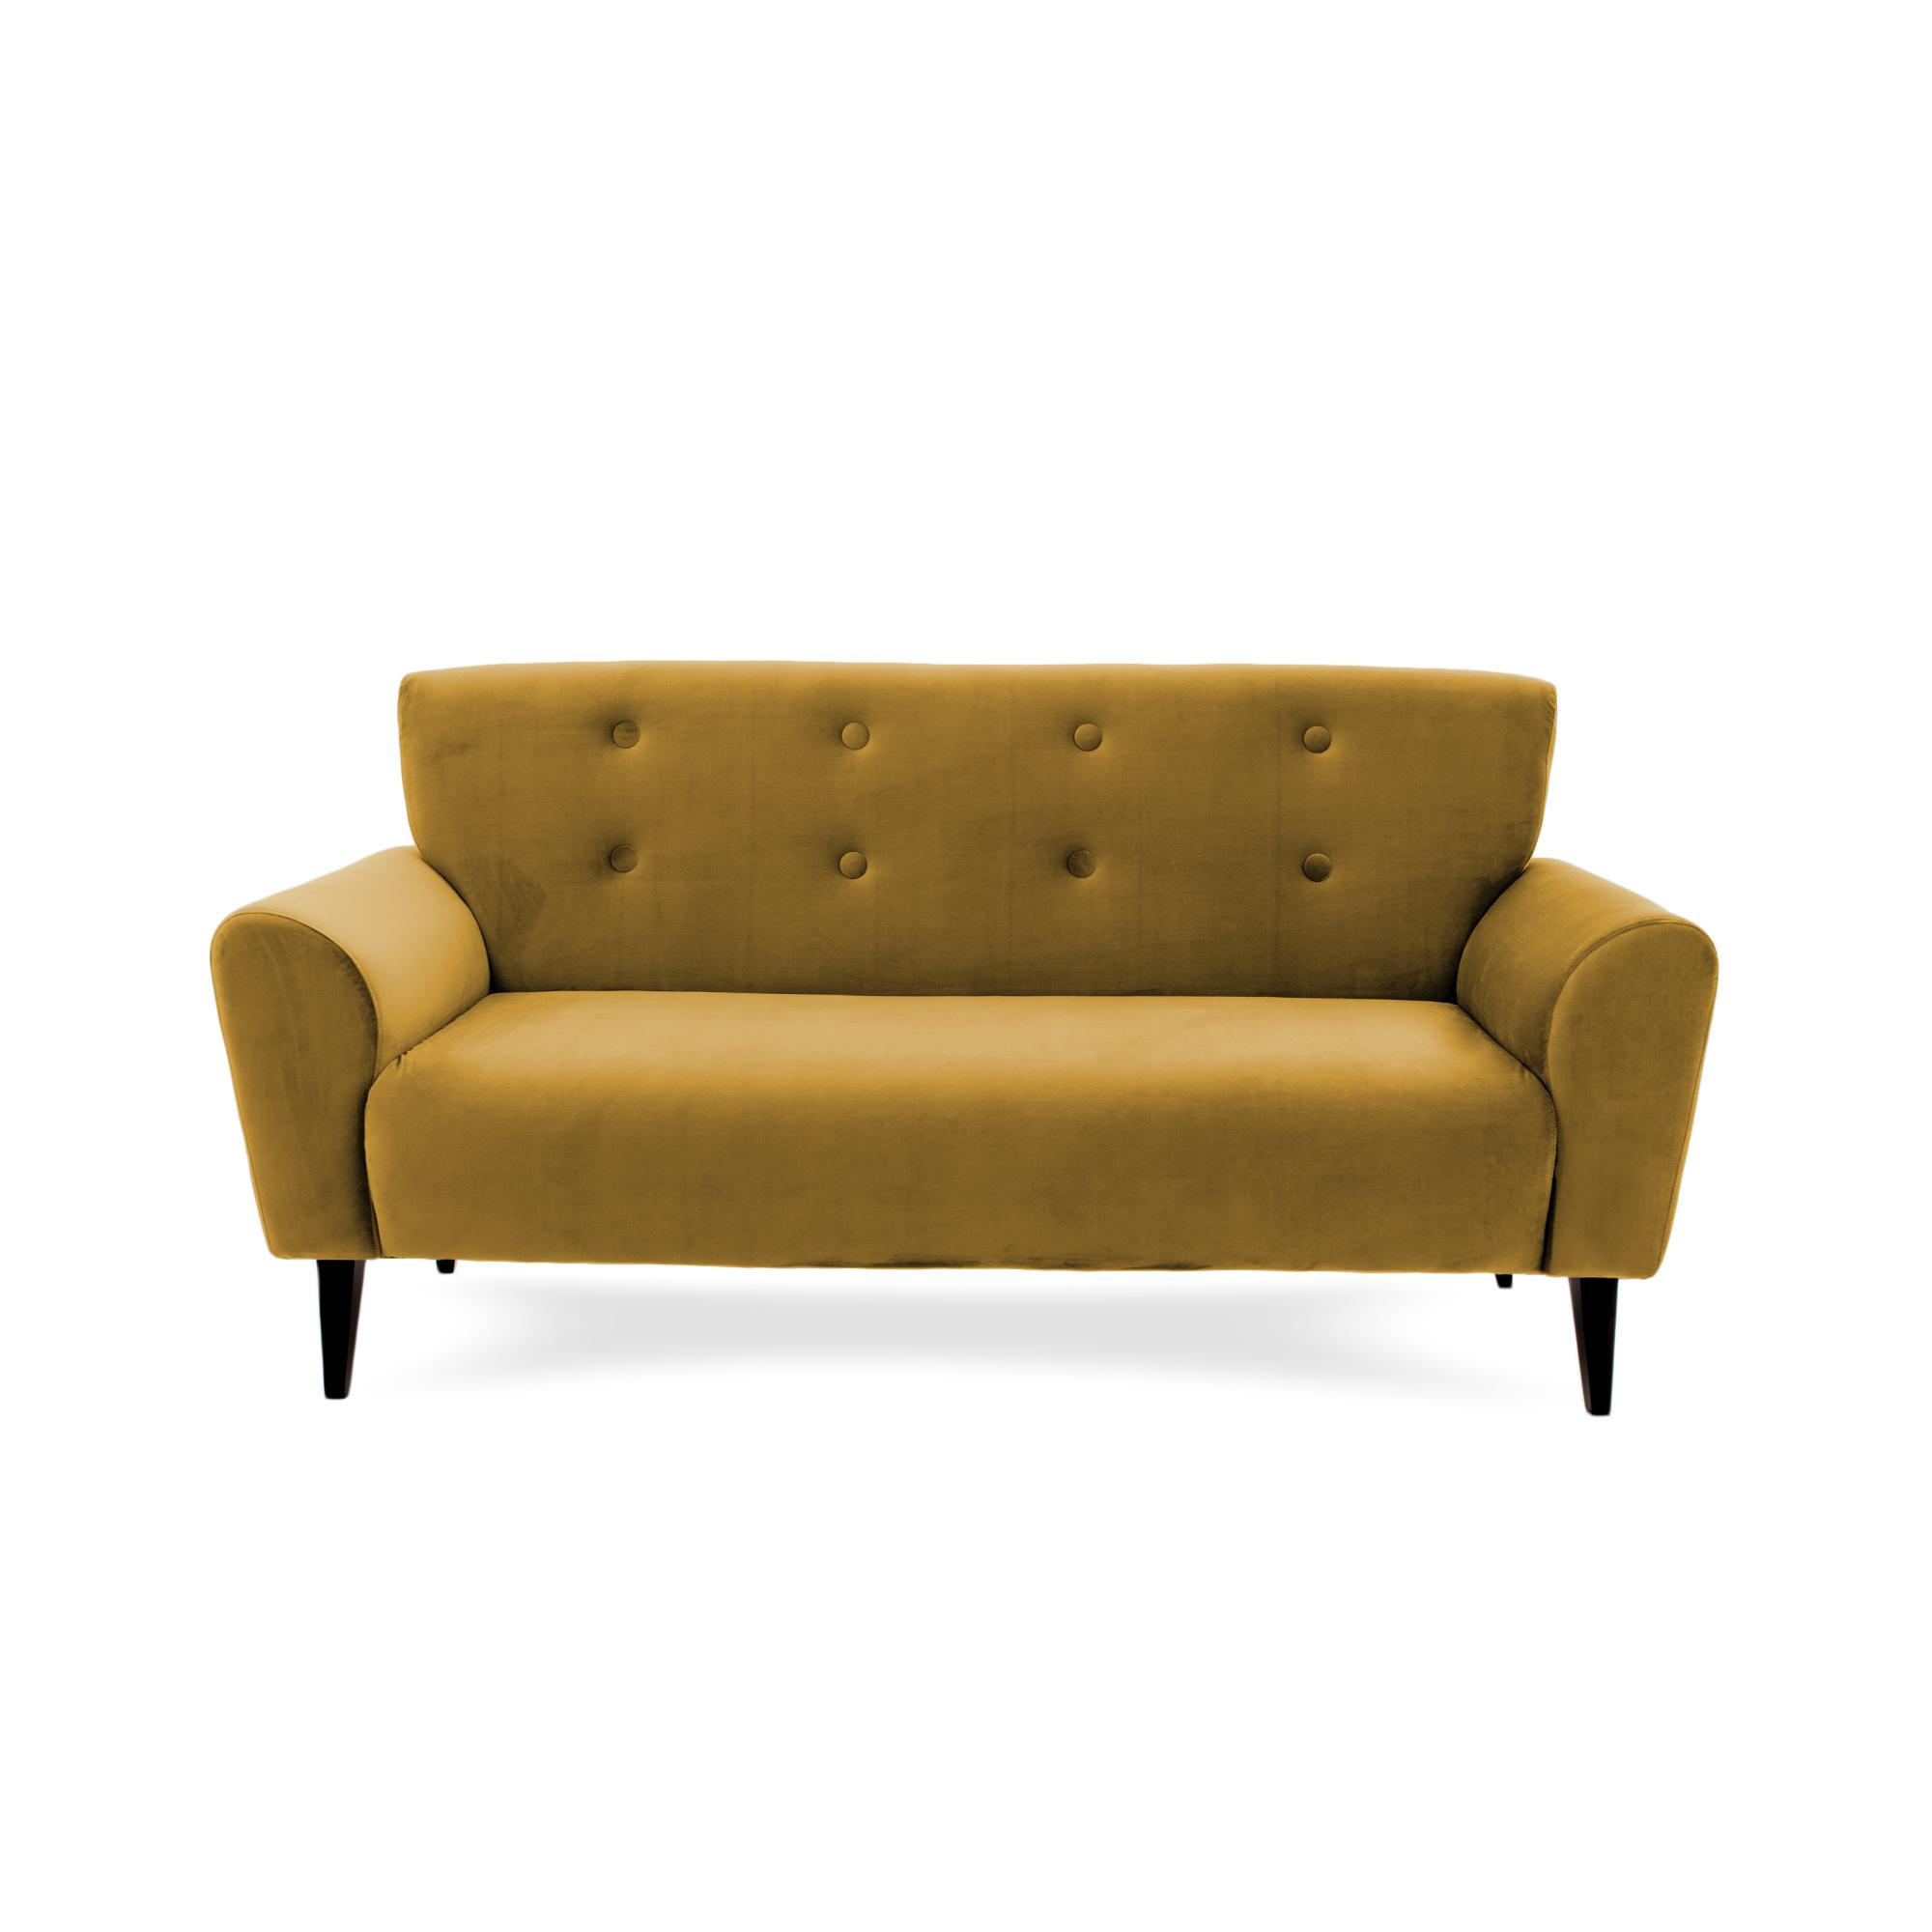 Canapea Fixa 3 locuri Kiara Mustard